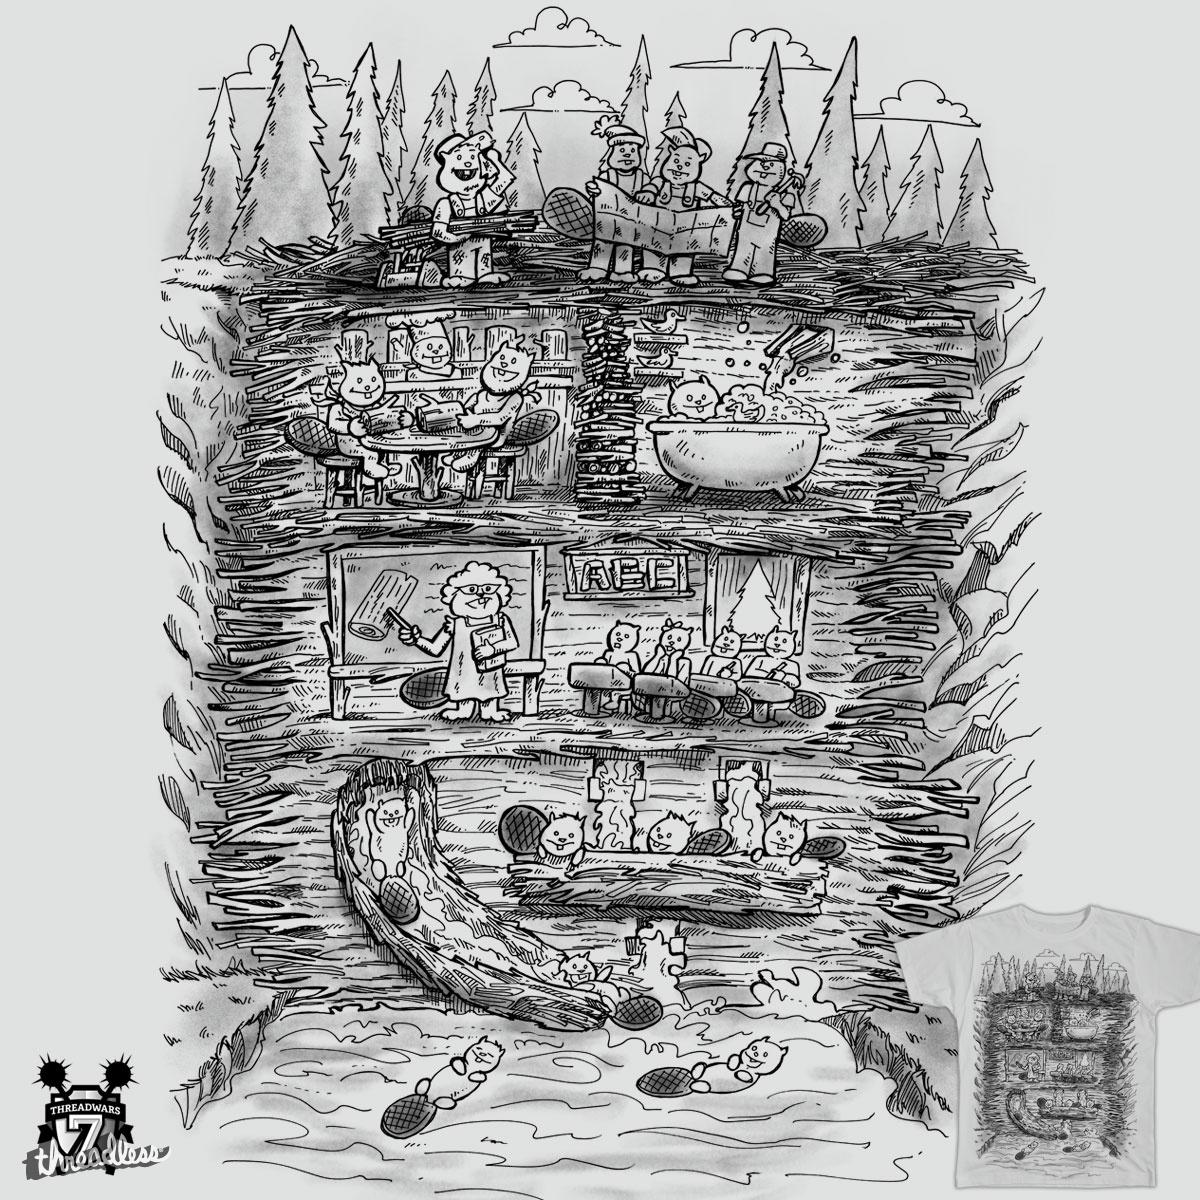 Mr Beaver's Wonder Dam by nickv47 on Threadless